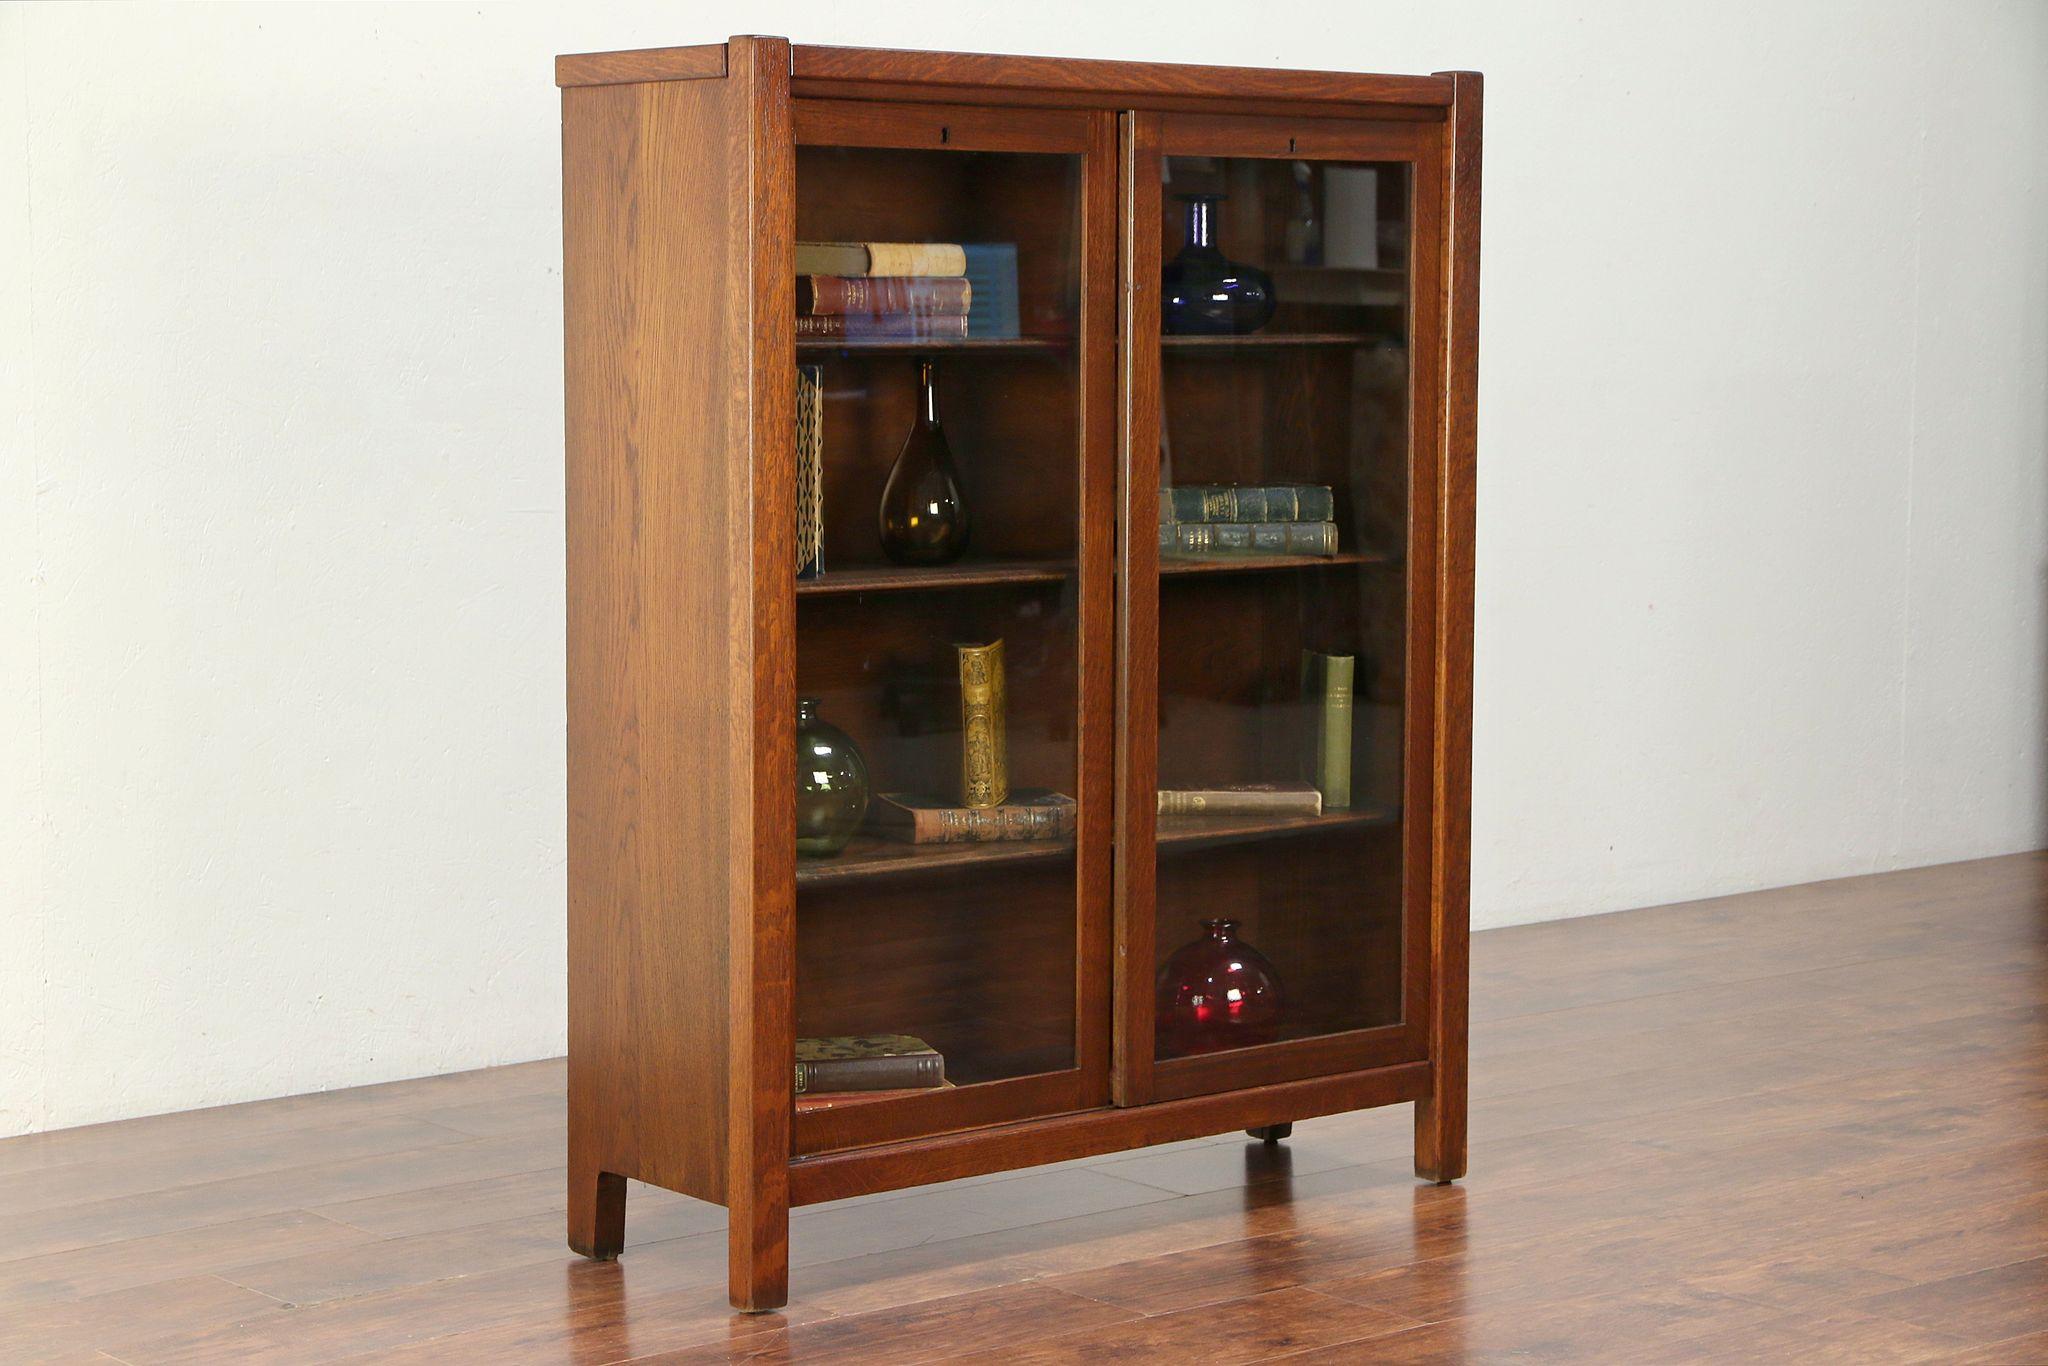 Arts Crafts Mission Oak Antique Craftsman Bookcase Sliding Glass Doors 30015